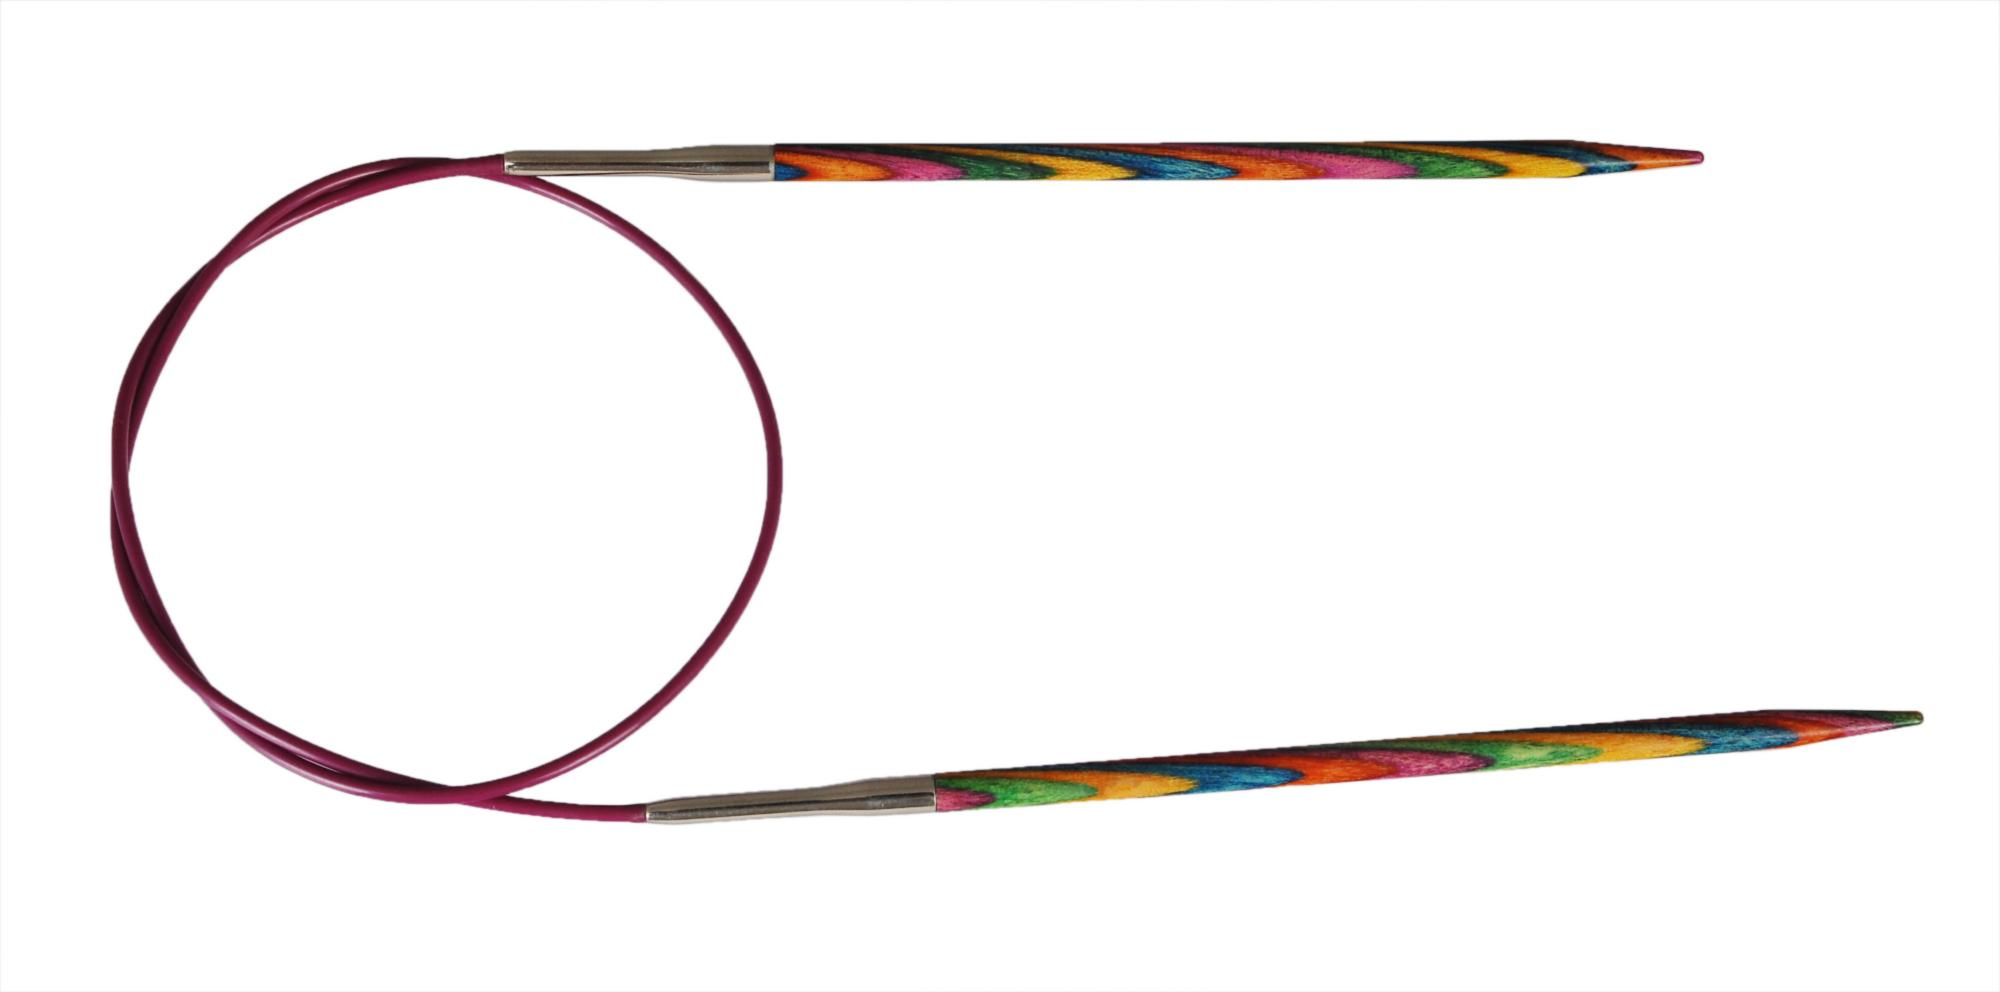 Спицы круговые 100 см Symfonie Wood KnitPro, 21351, 3.75 мм